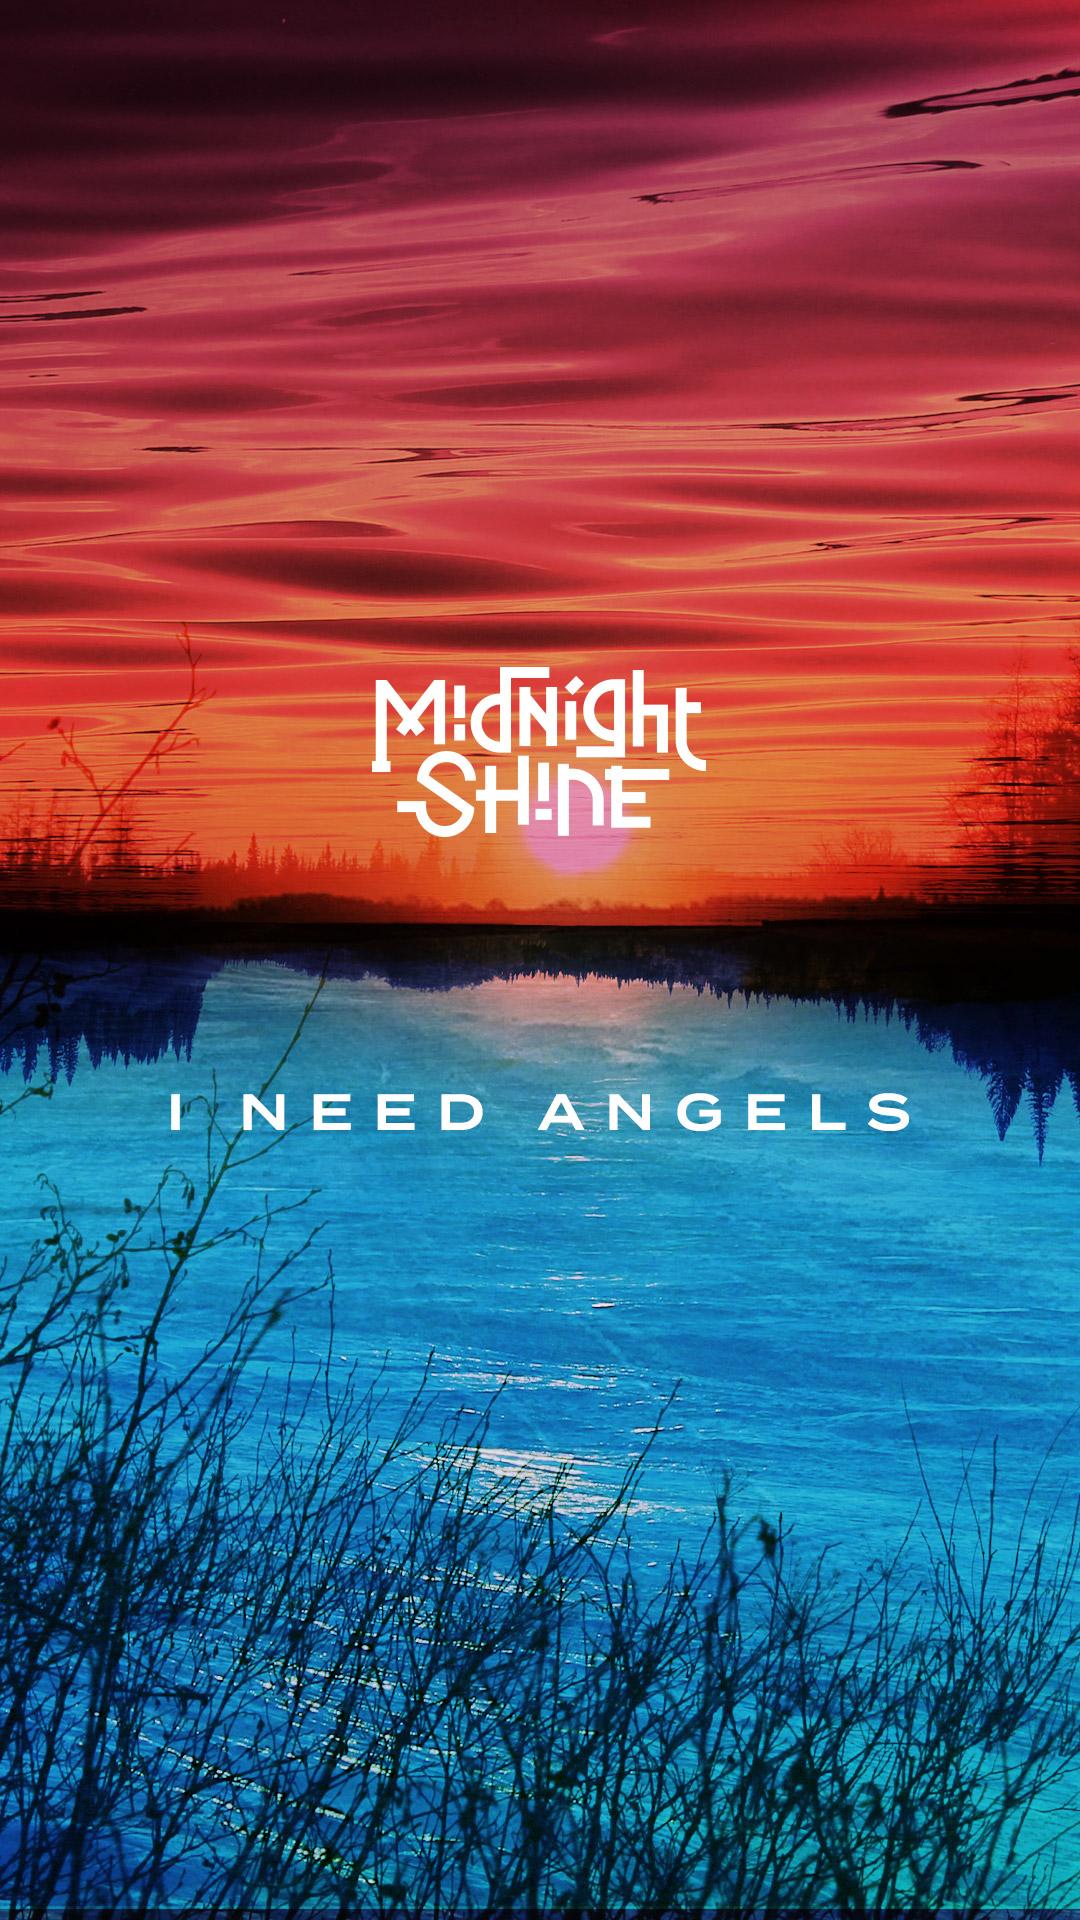 angels-phone